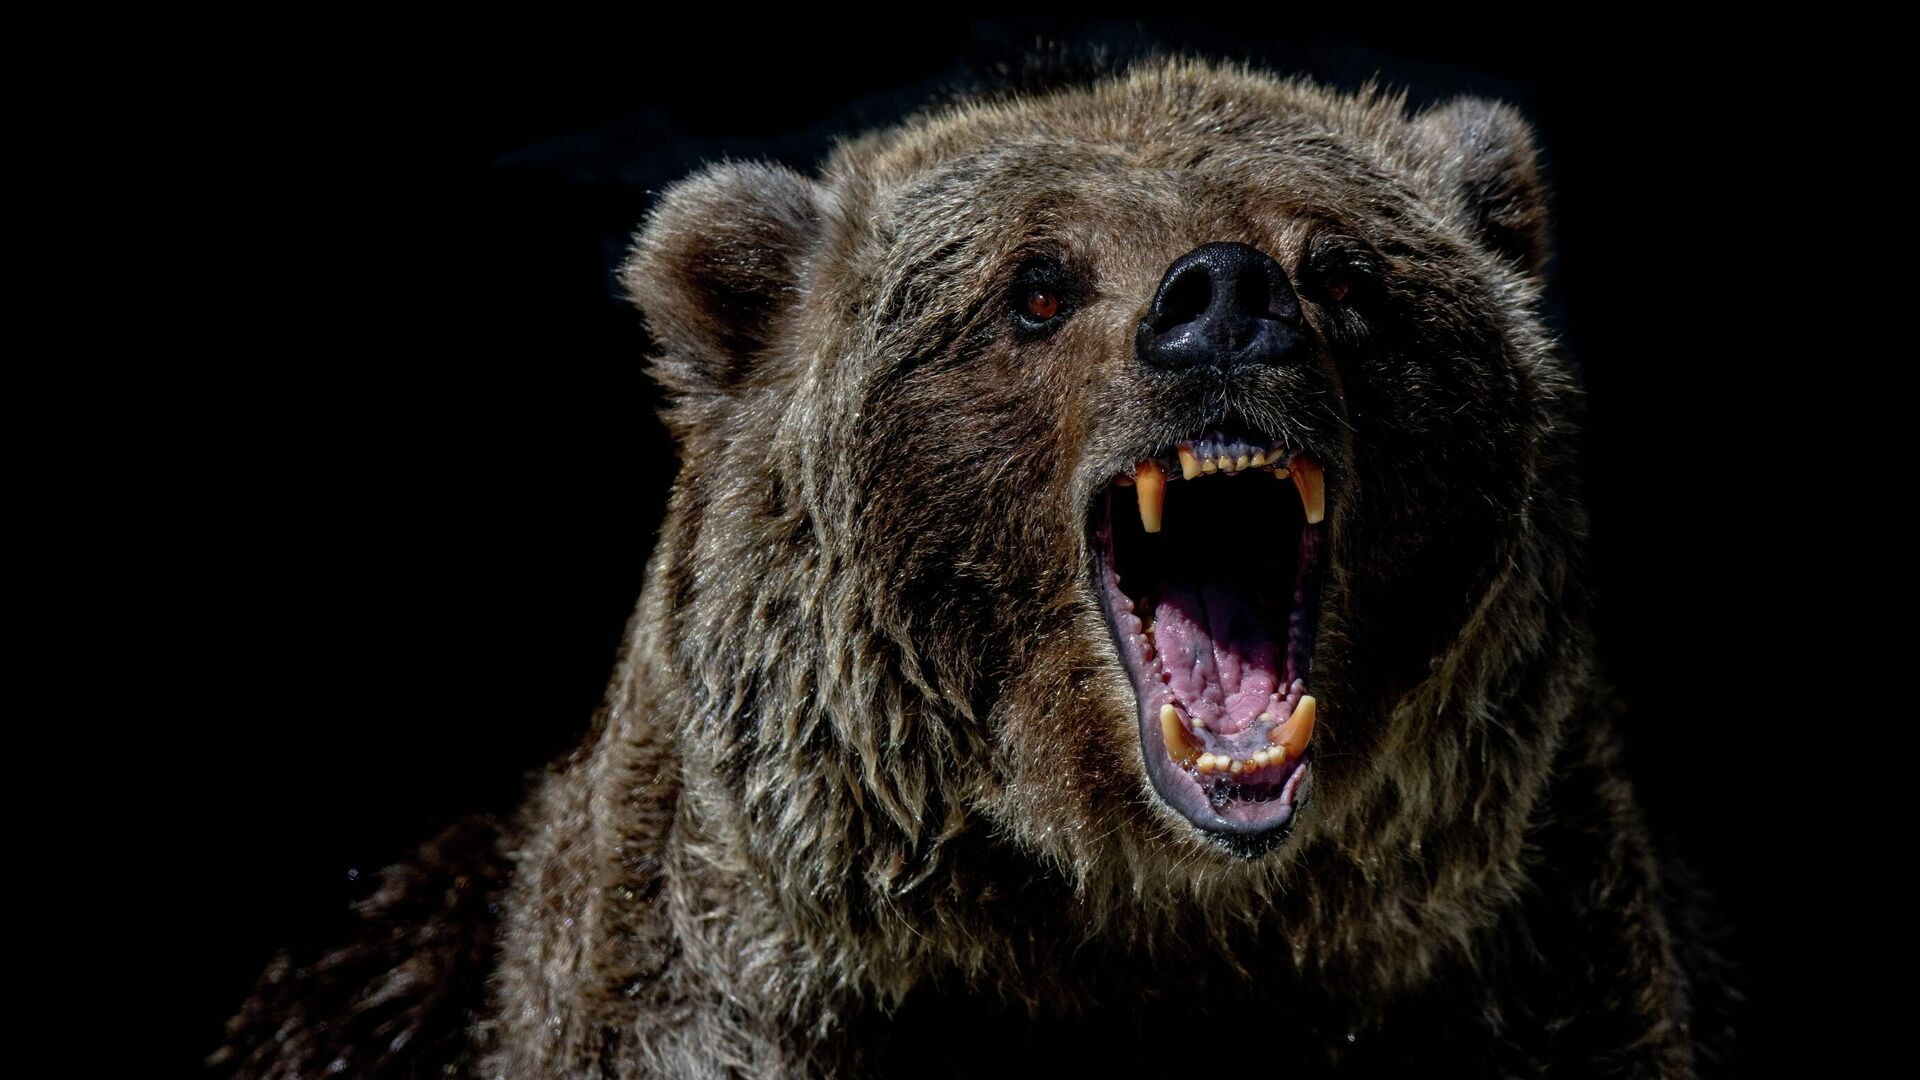 Un oso, imagen referencial - Sputnik Mundo, 1920, 01.06.2021